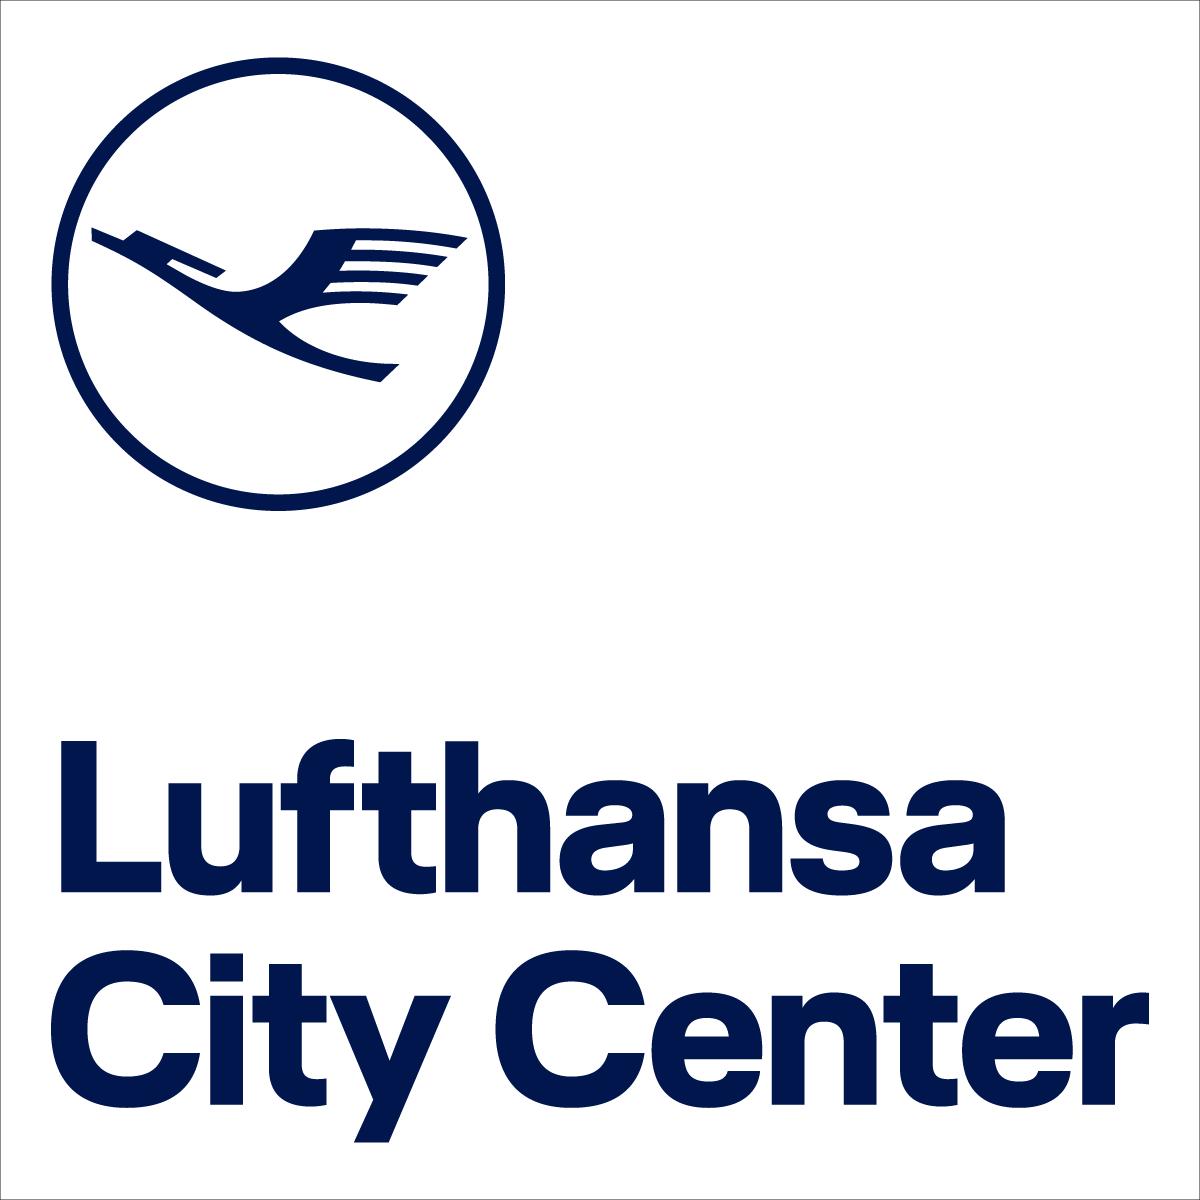 Lufthansa City Center Reisebüropartner GmbH